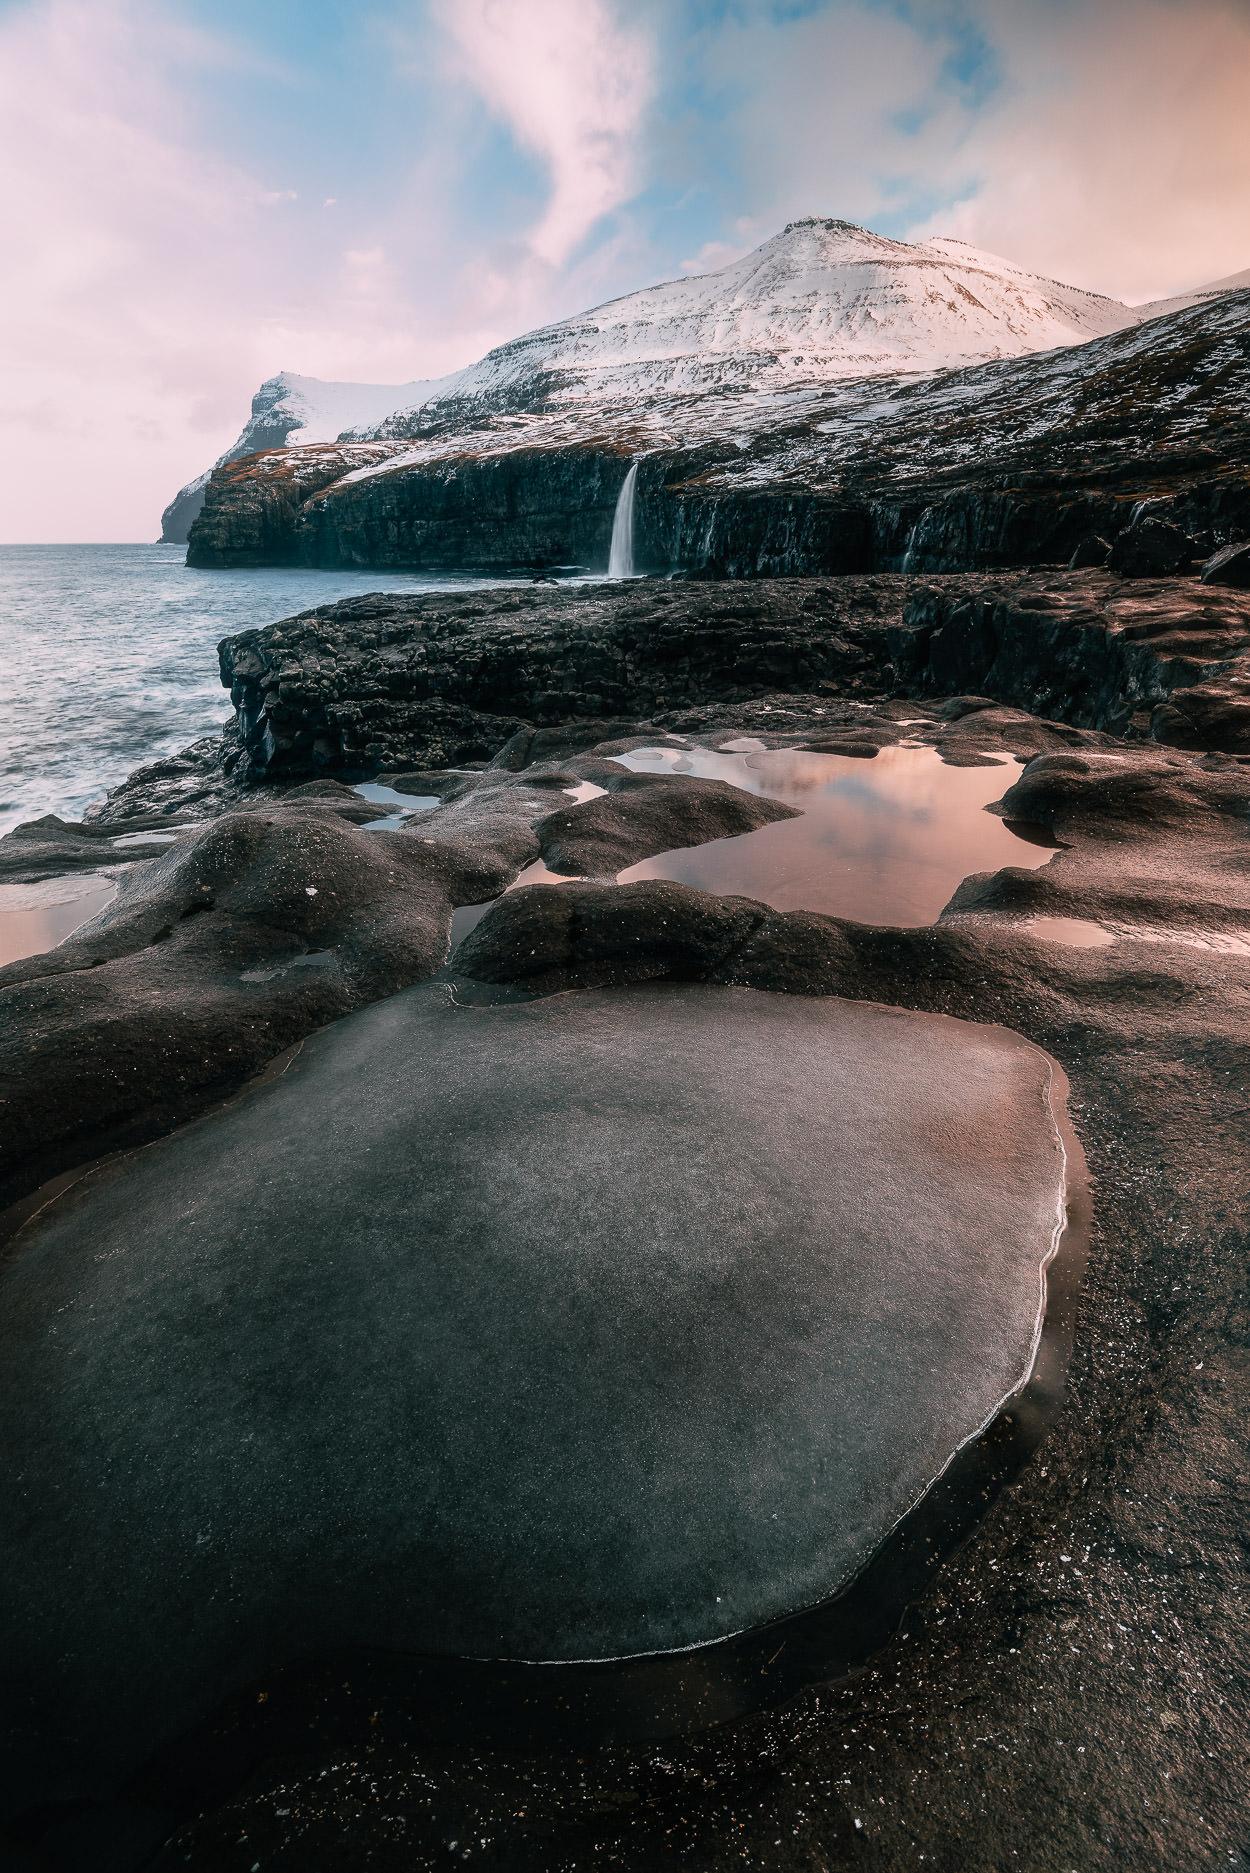 2019.02.06_Faroe_Coast_Eysturoy_Hike_A7III-8672-Edit-Edit.jpg